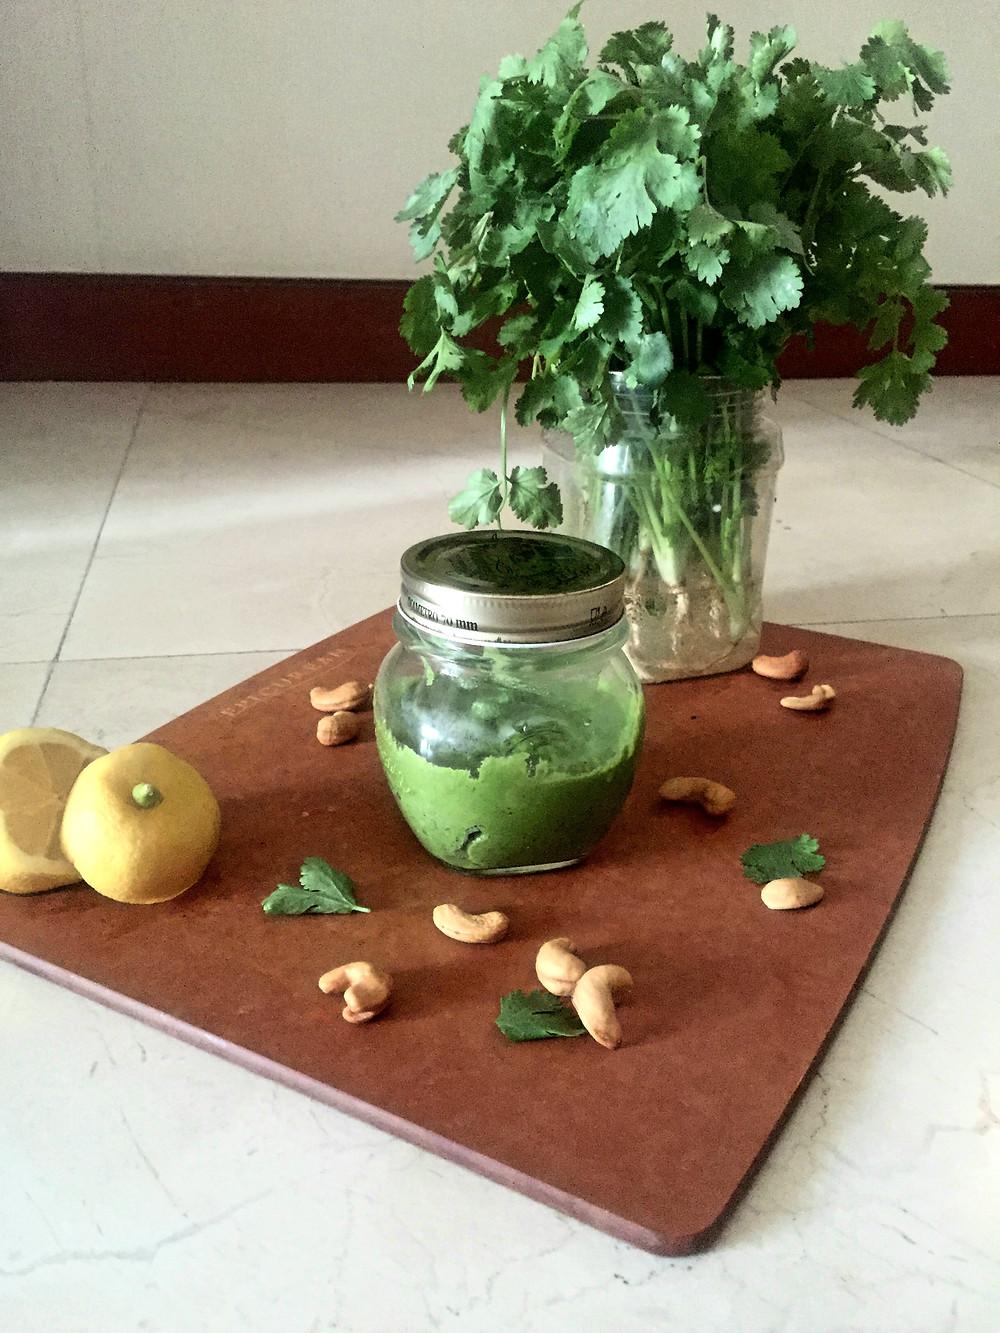 creamy versatile pesto to pair with pasta cracker dip or any meal